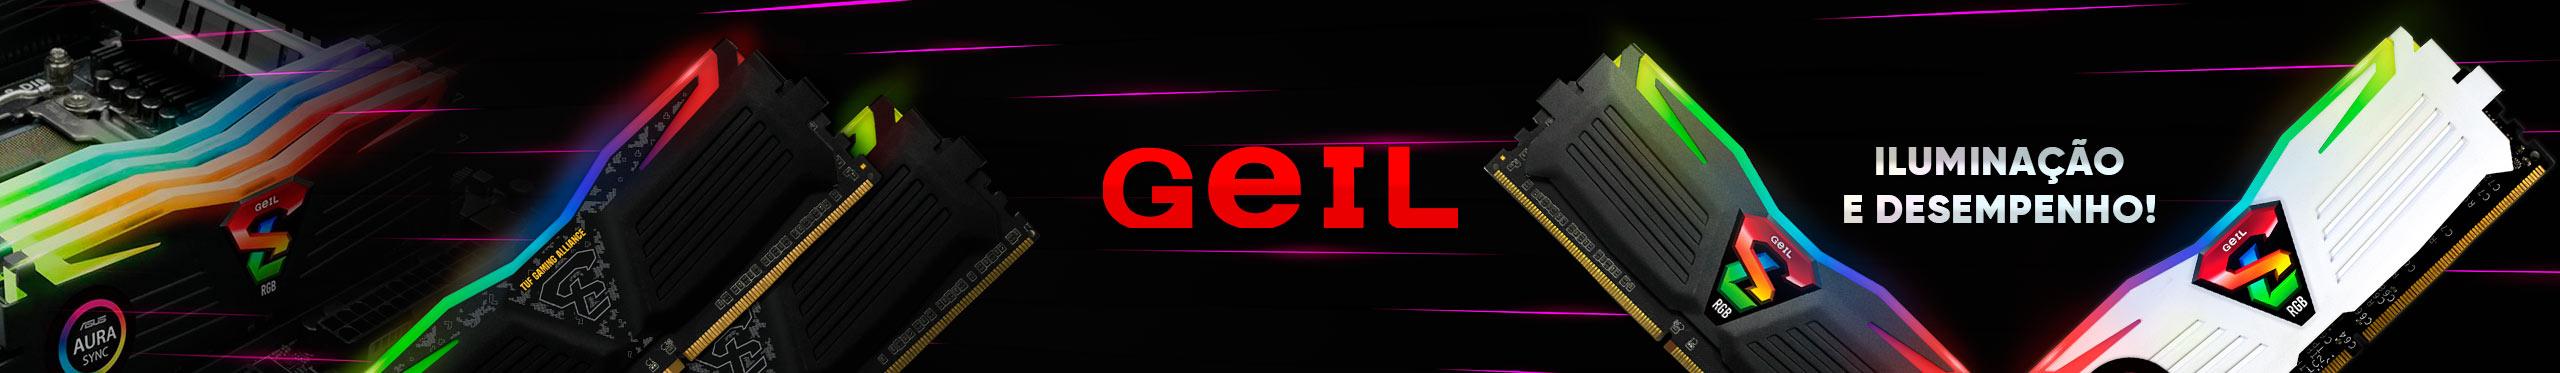 Banner Memórias Geil Abril 2021